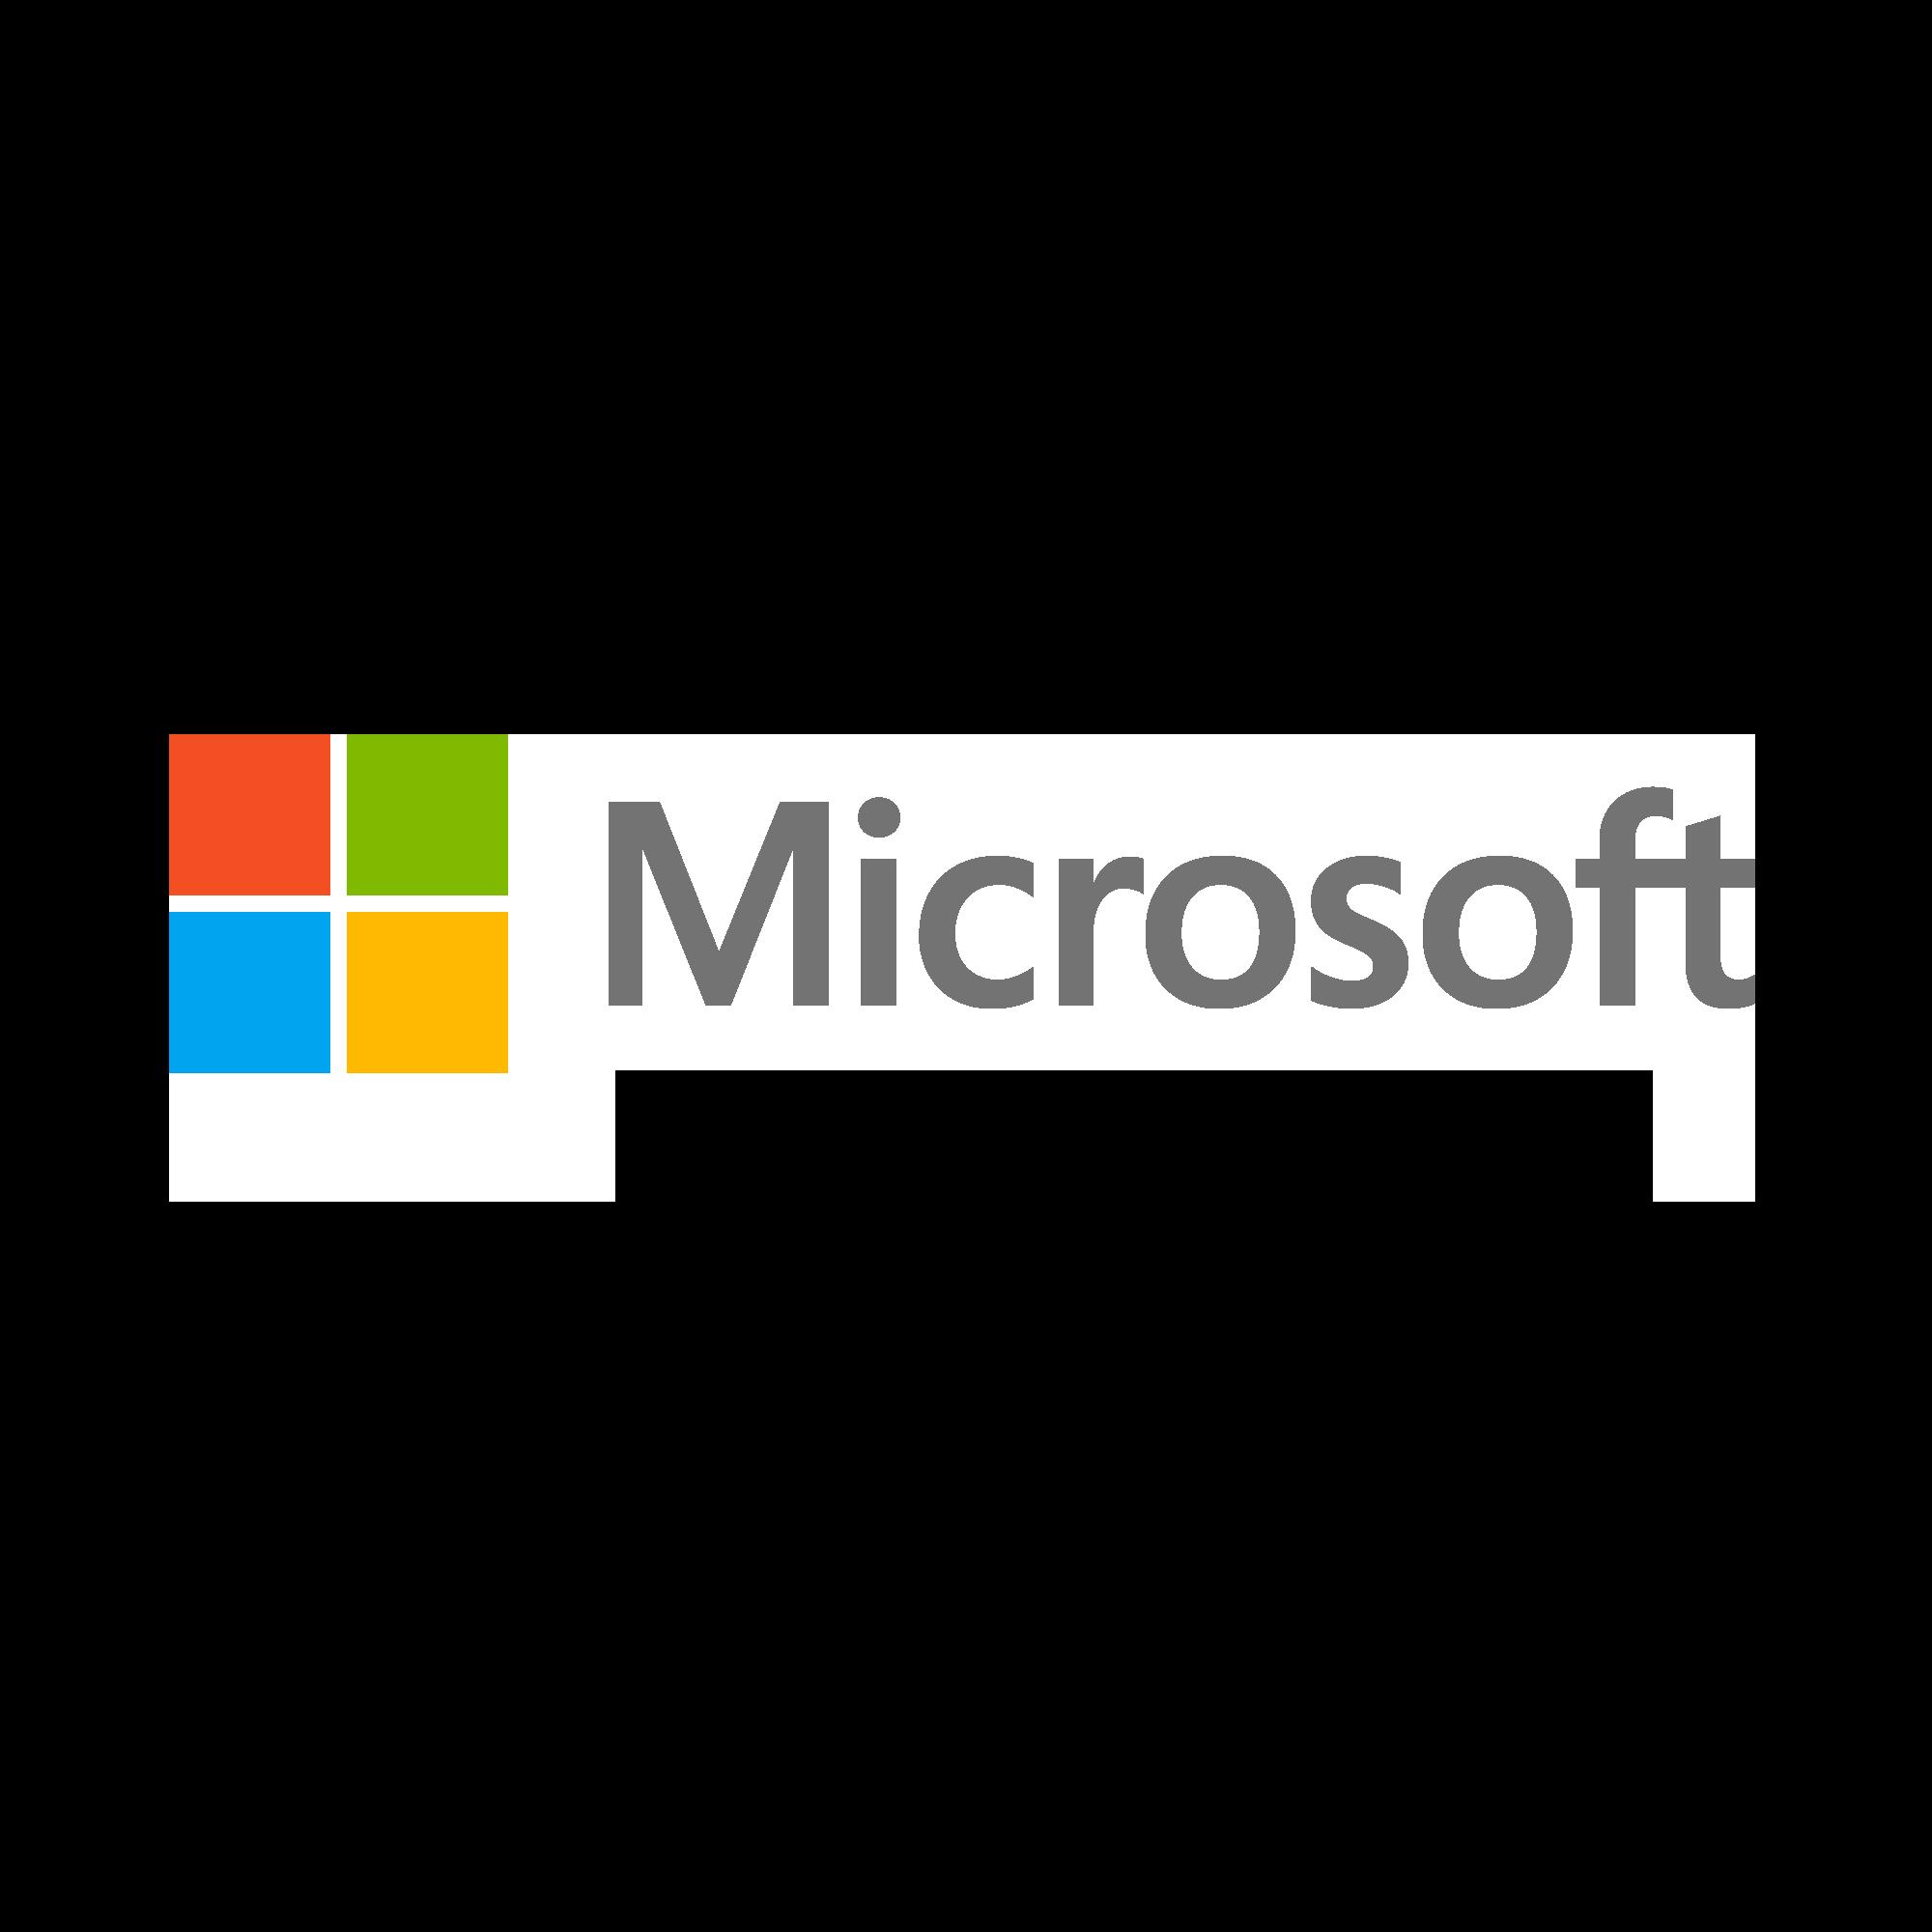 Microsoft_Partner_Network.png